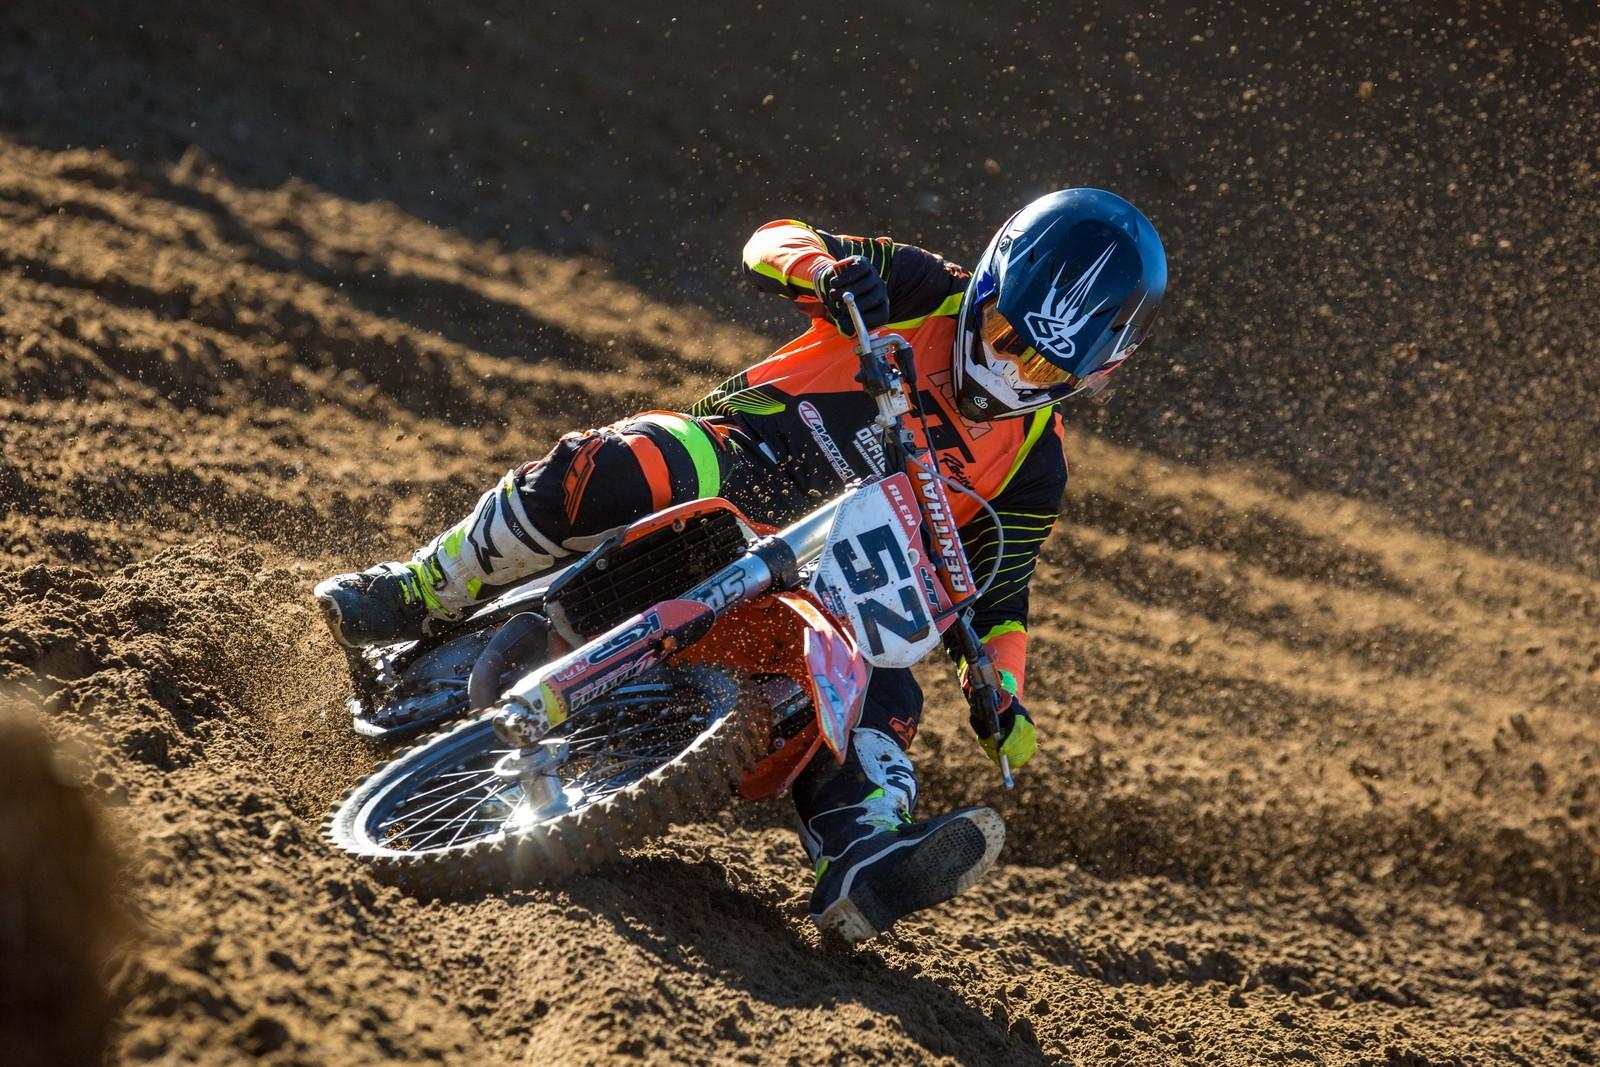 James Alen - Australian Motul MX Championships: Round 6, Nowra - Motocross Pictures - Vital MX